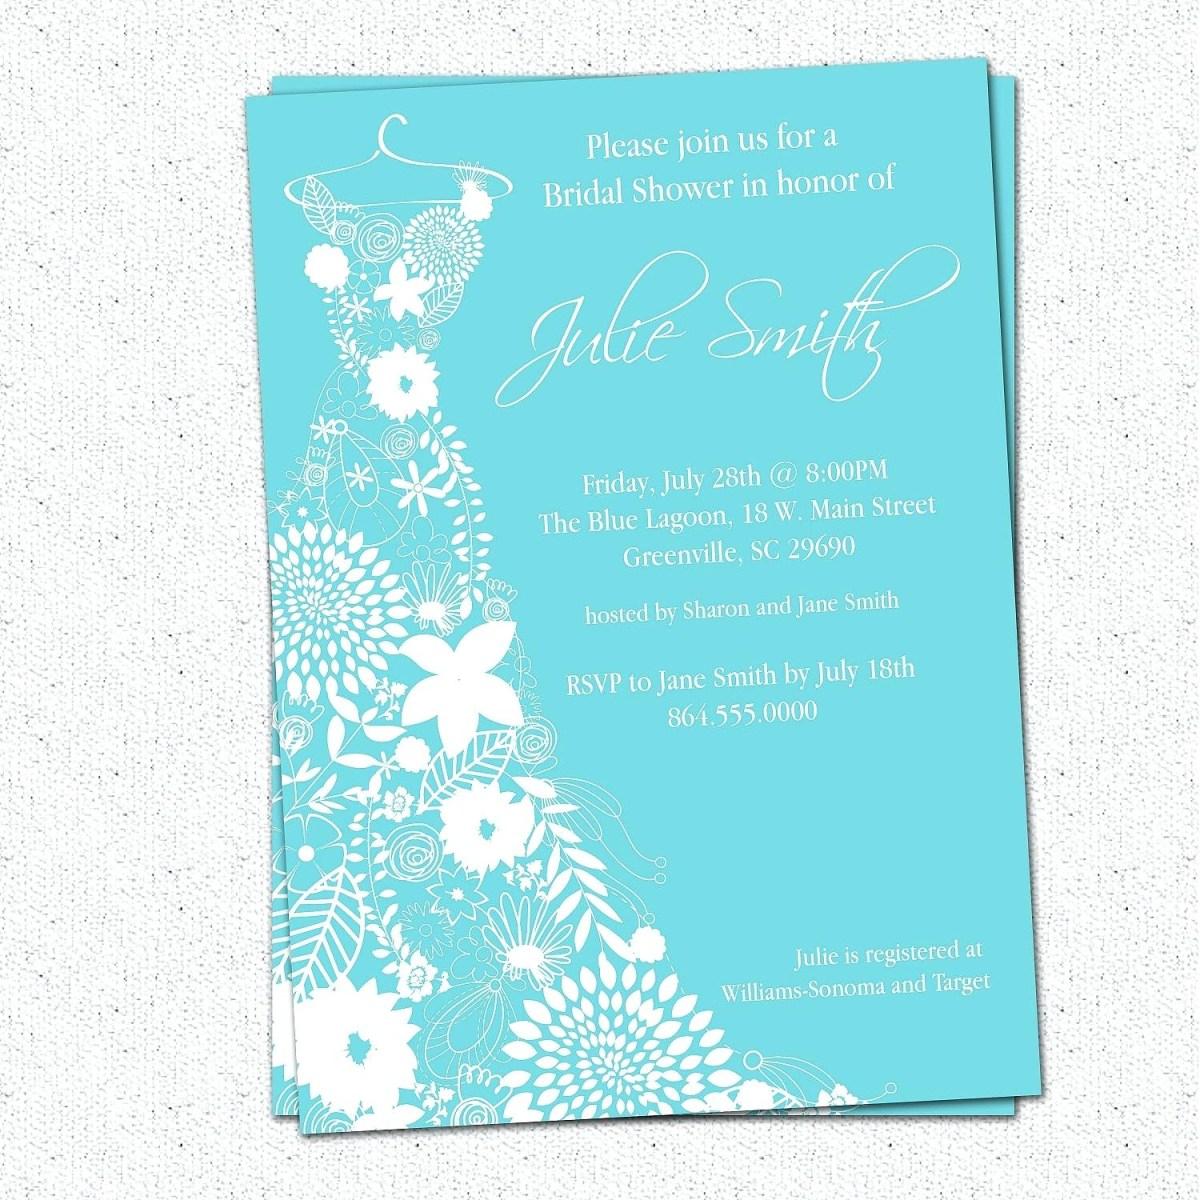 Free Printable Wedding Invitation Templates Download Printable Wedding Invitation Template